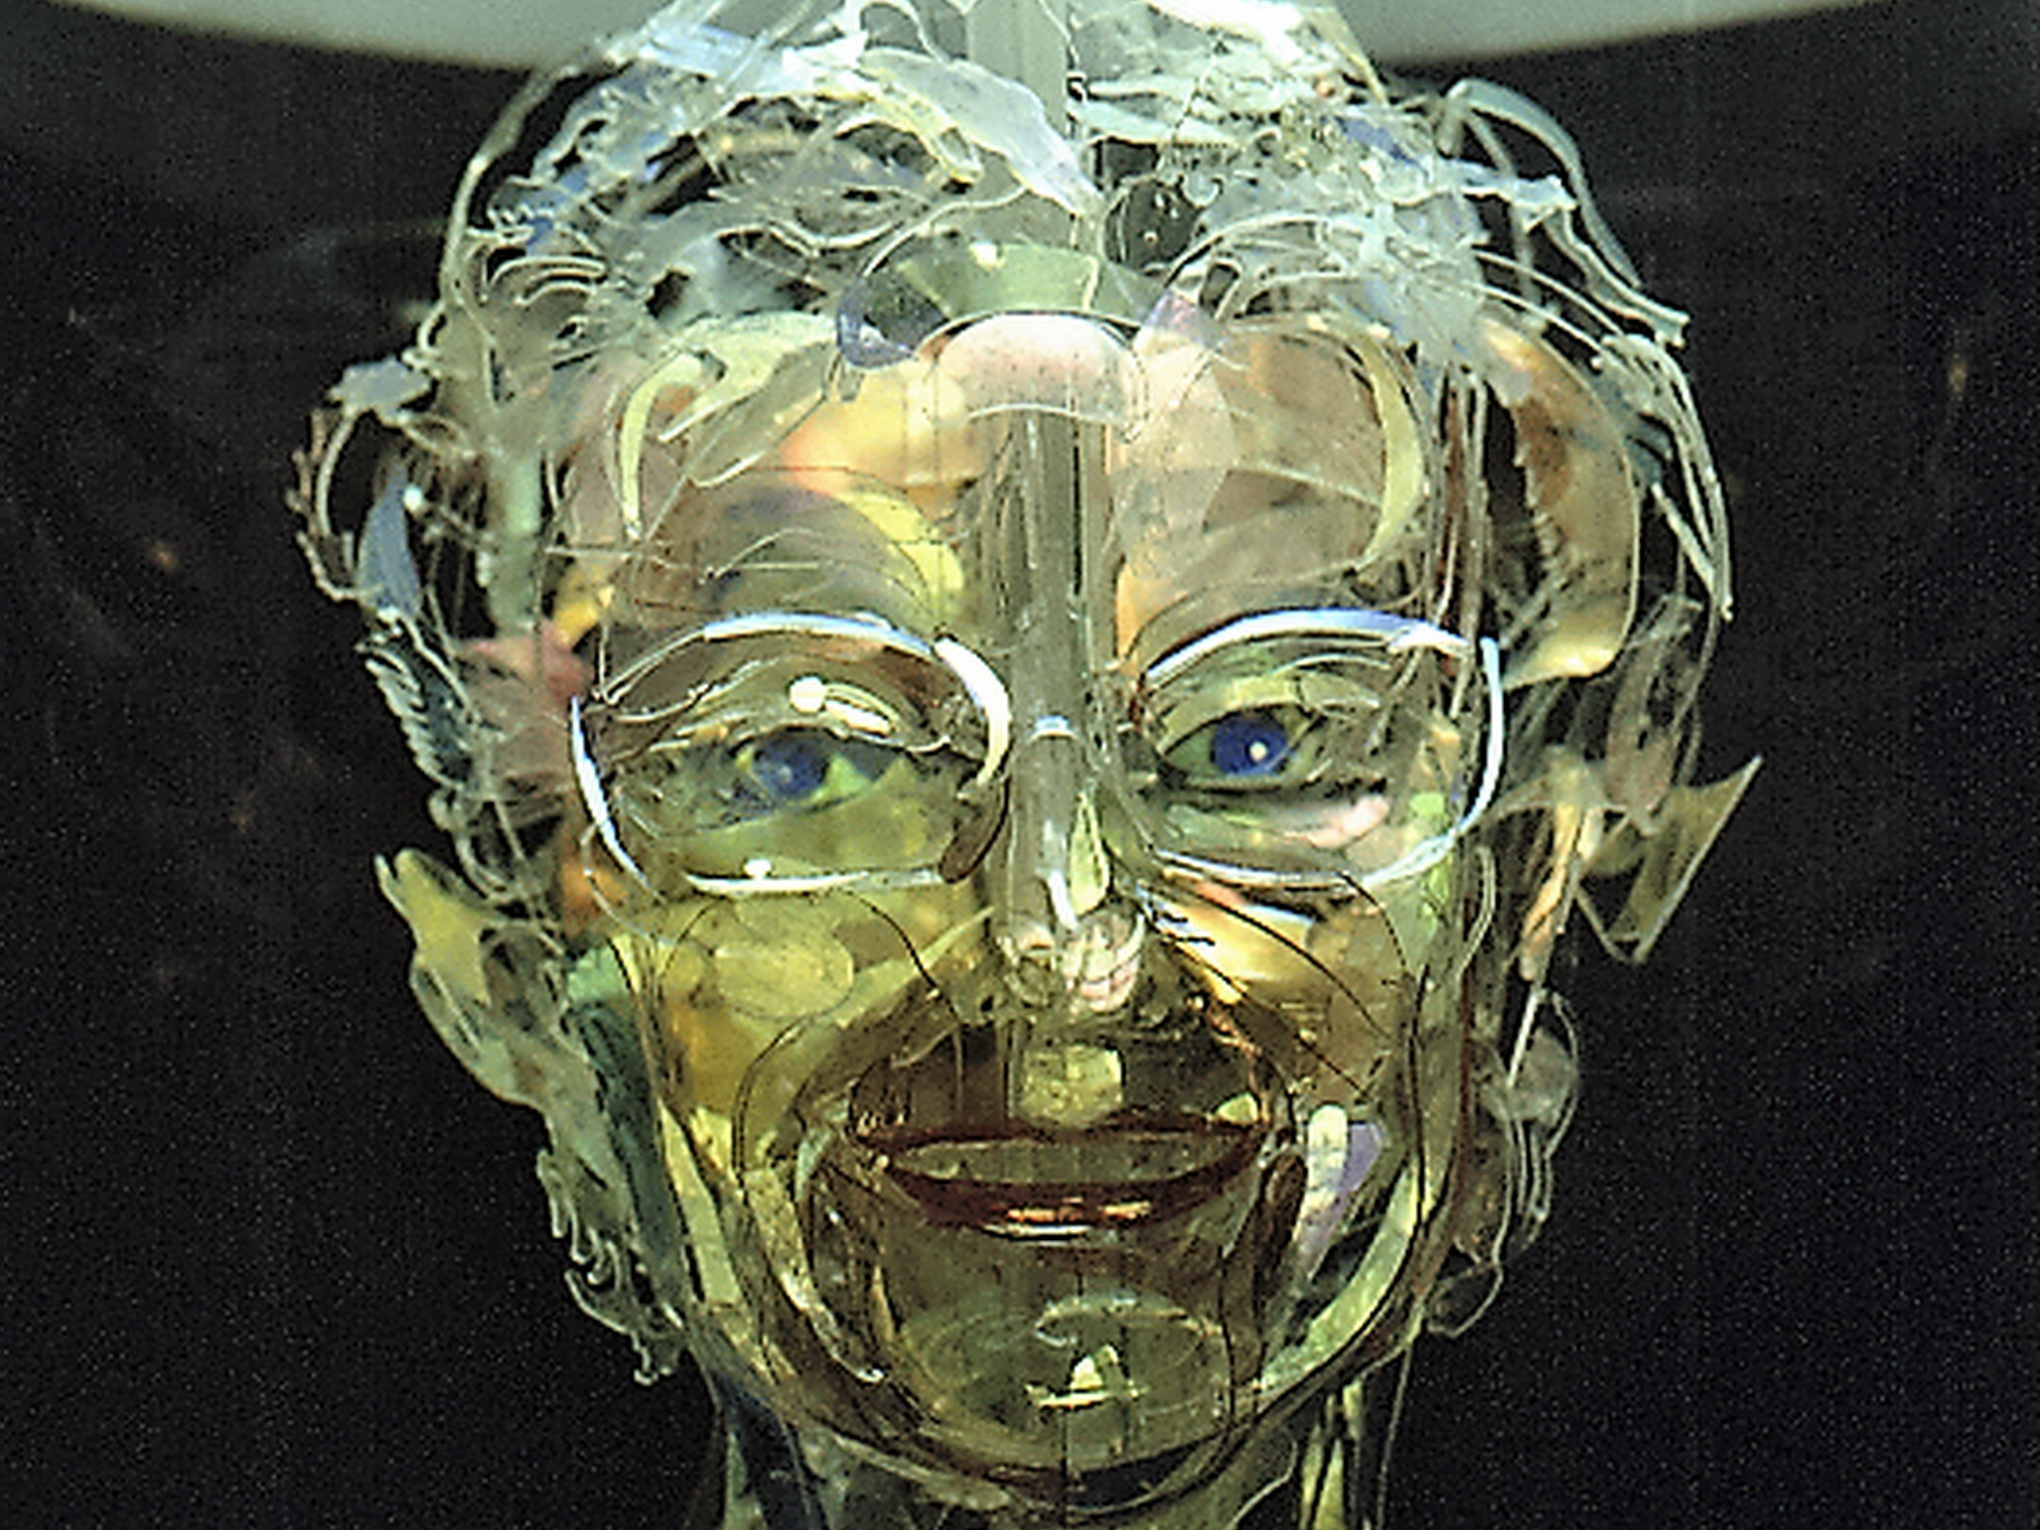 Maurizio Aprea - Signora - Endosculpture